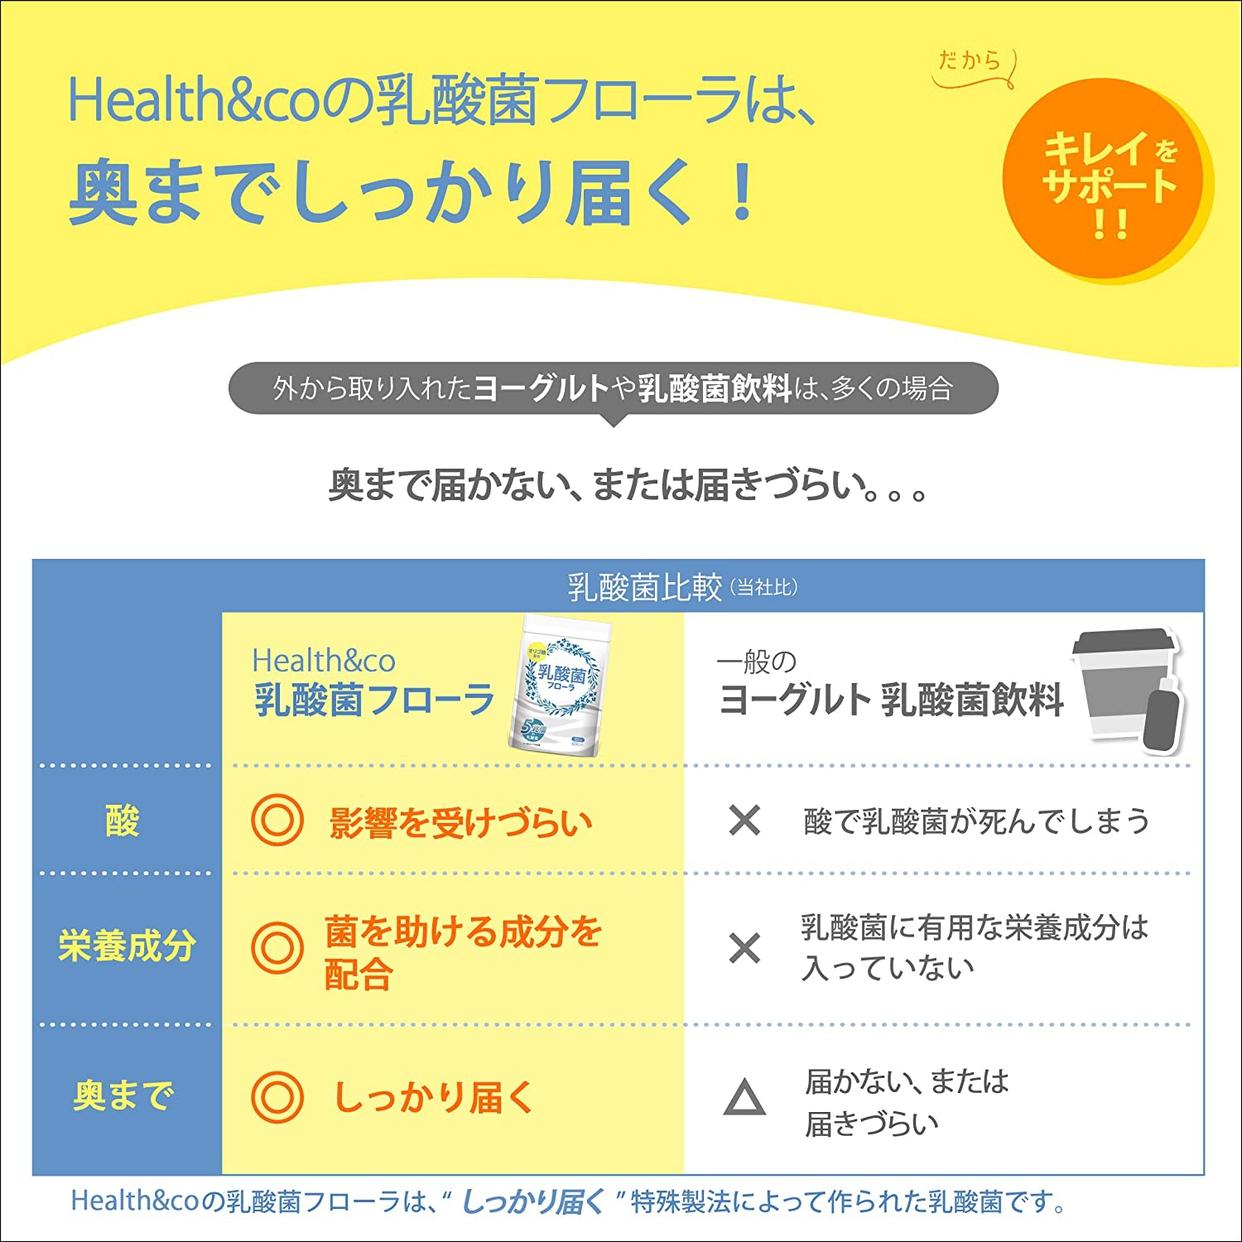 Health&co(ヘルスアンドコー) 乳酸菌 フローラの商品画像2